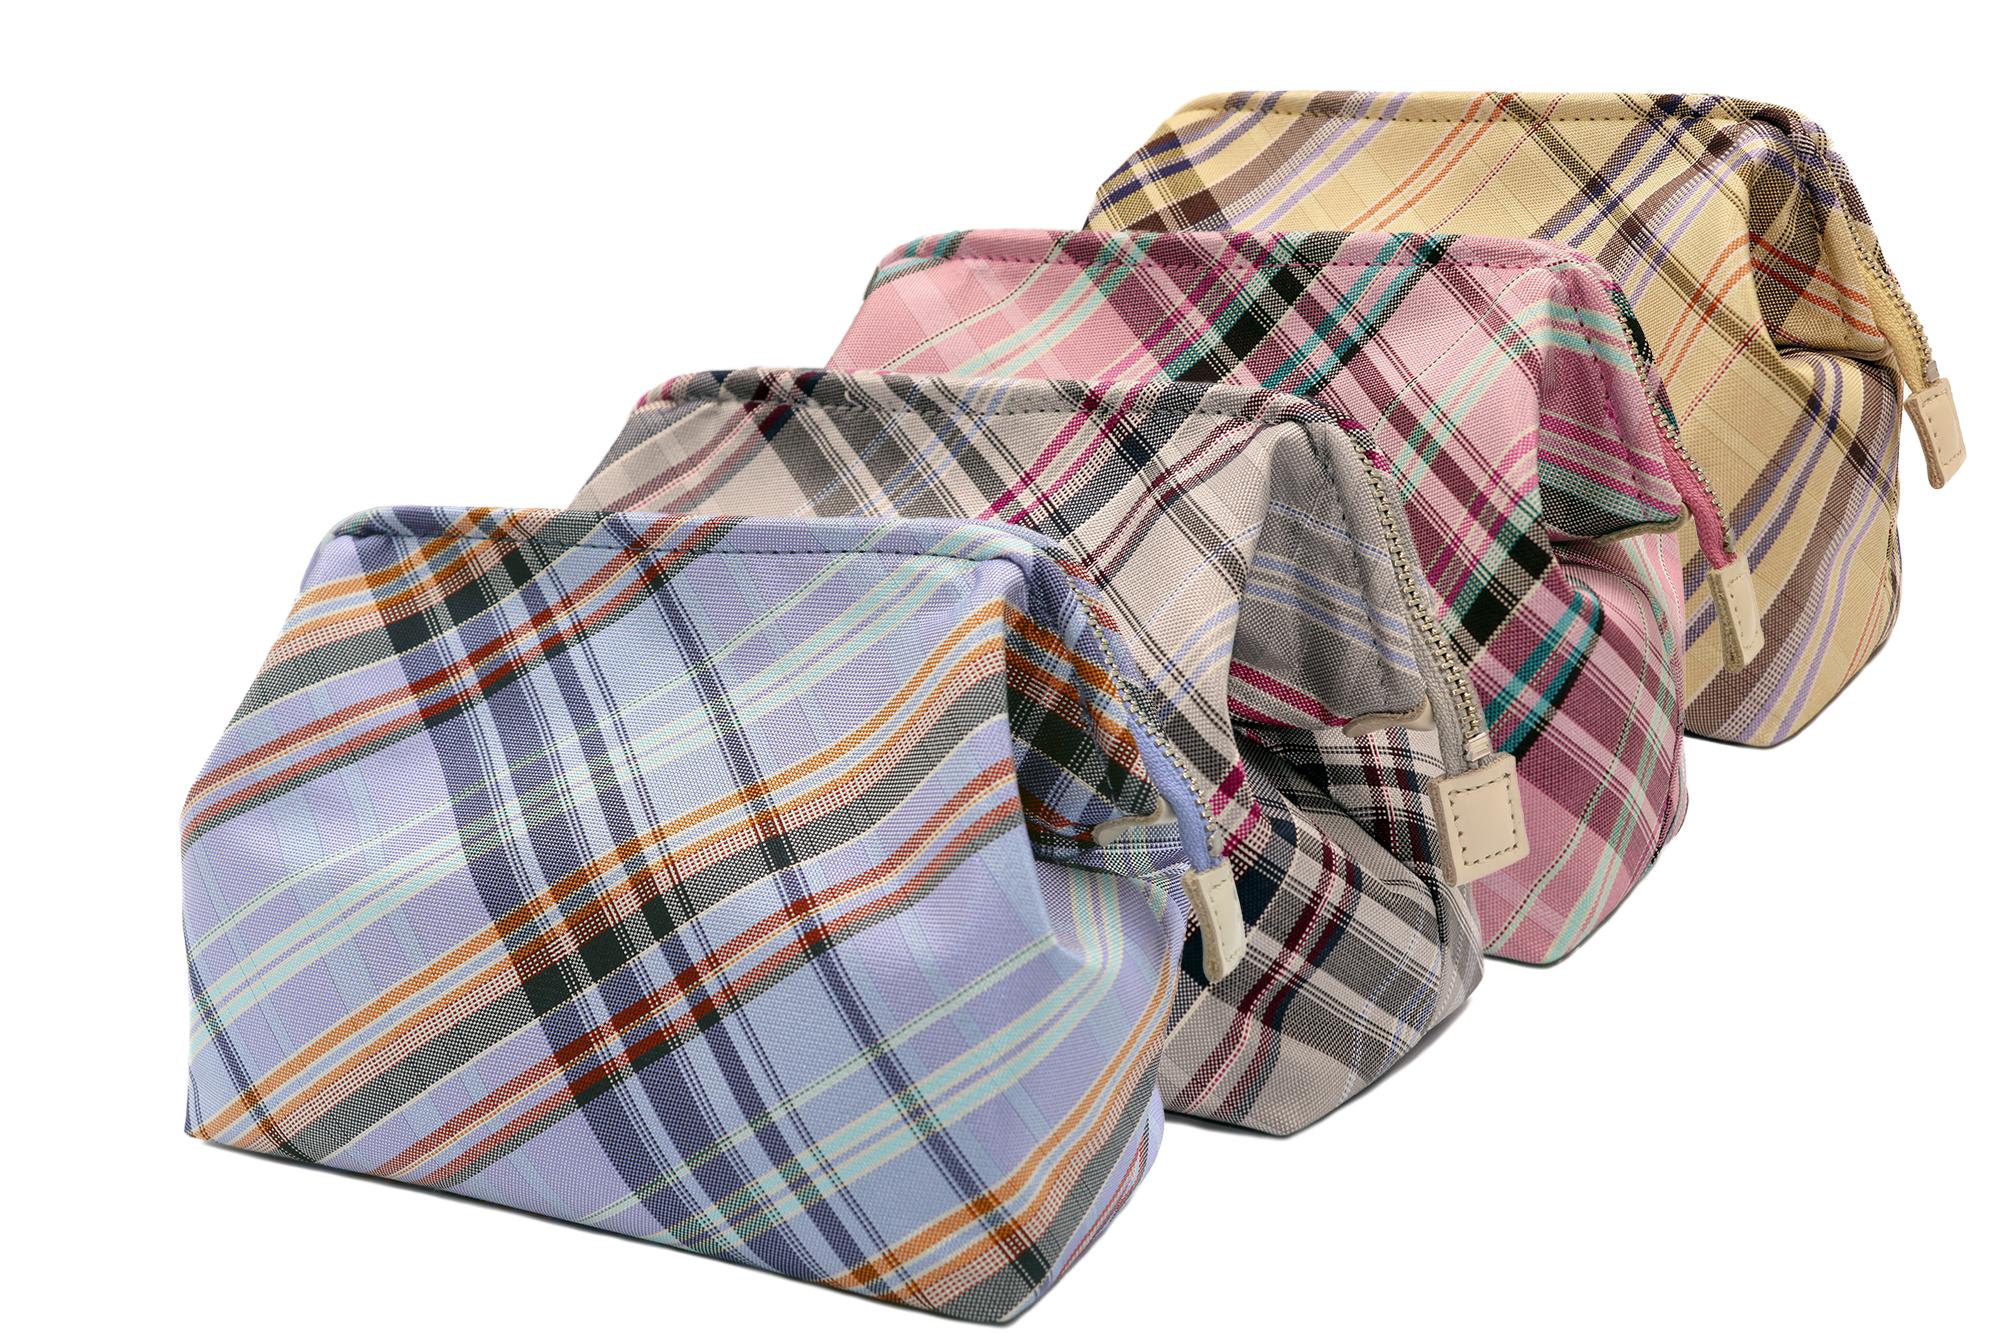 Atelier Kyoto Nishijin/西陣織シルク・がばっと開くアクセサリーポーチ・マルチチェック・ローズピンク・日本製